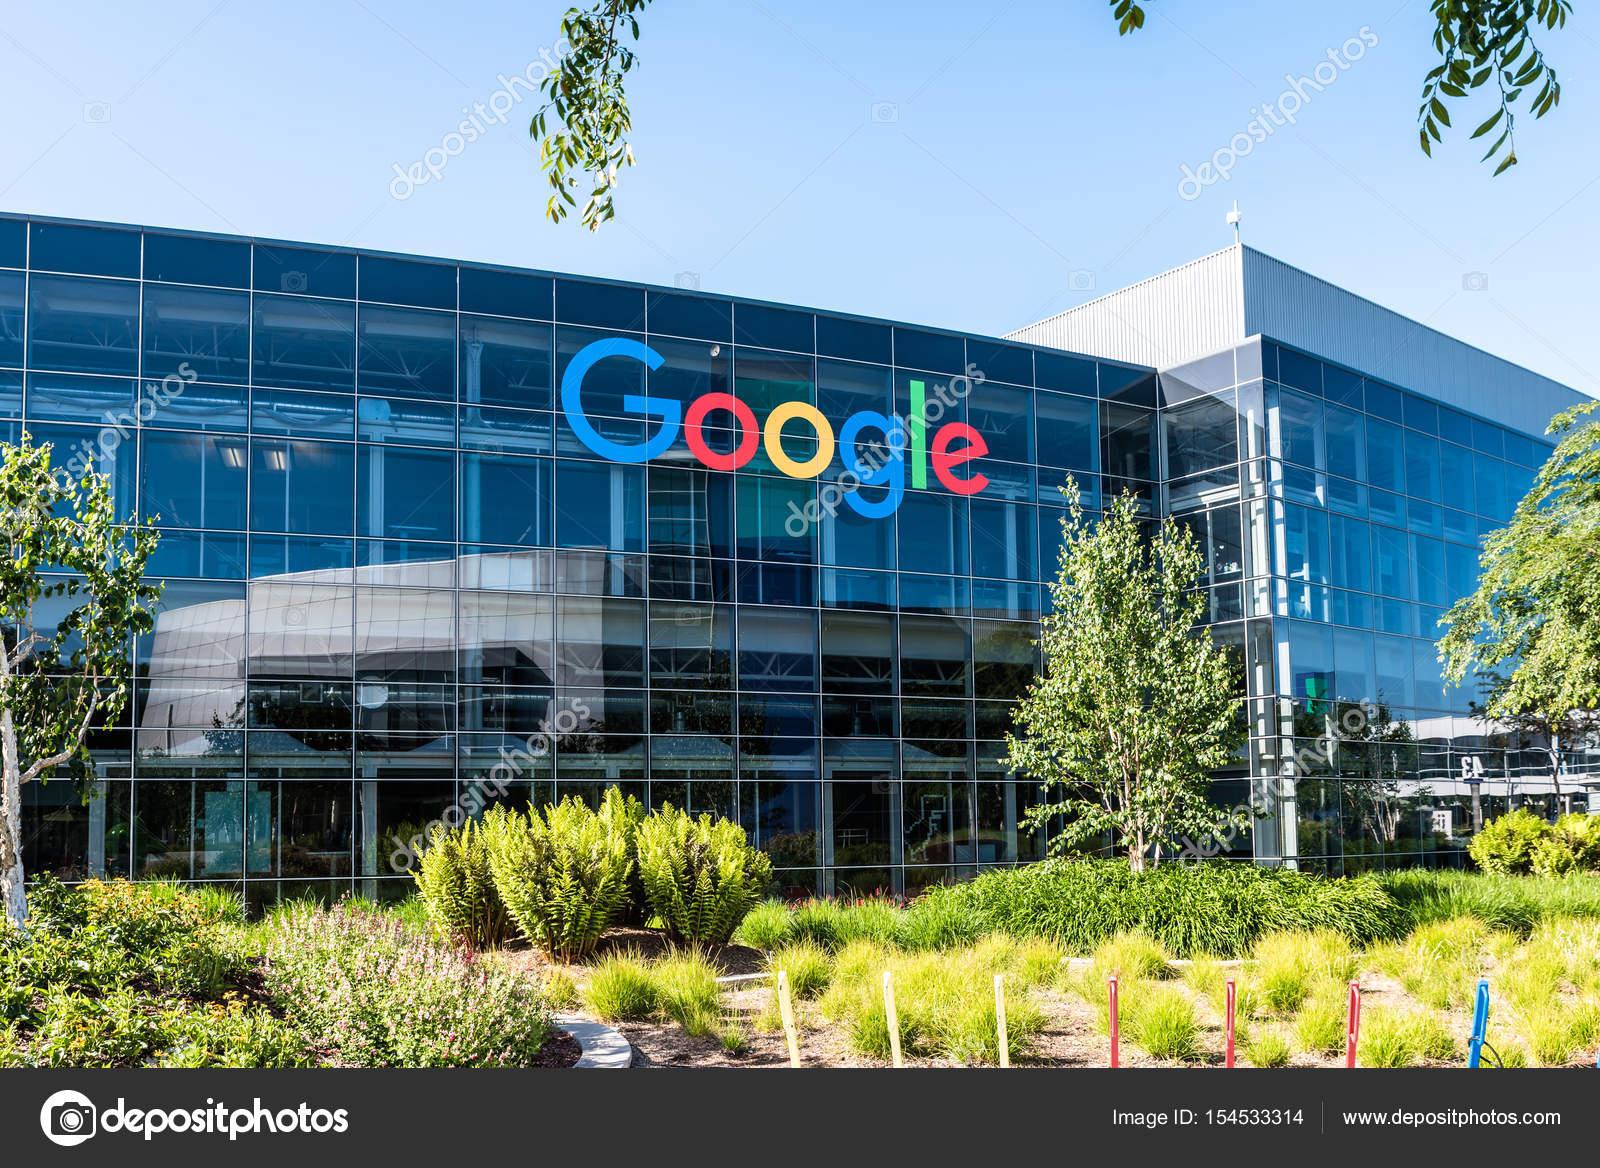 Googleplex - Google Headquarters in California — stock photo